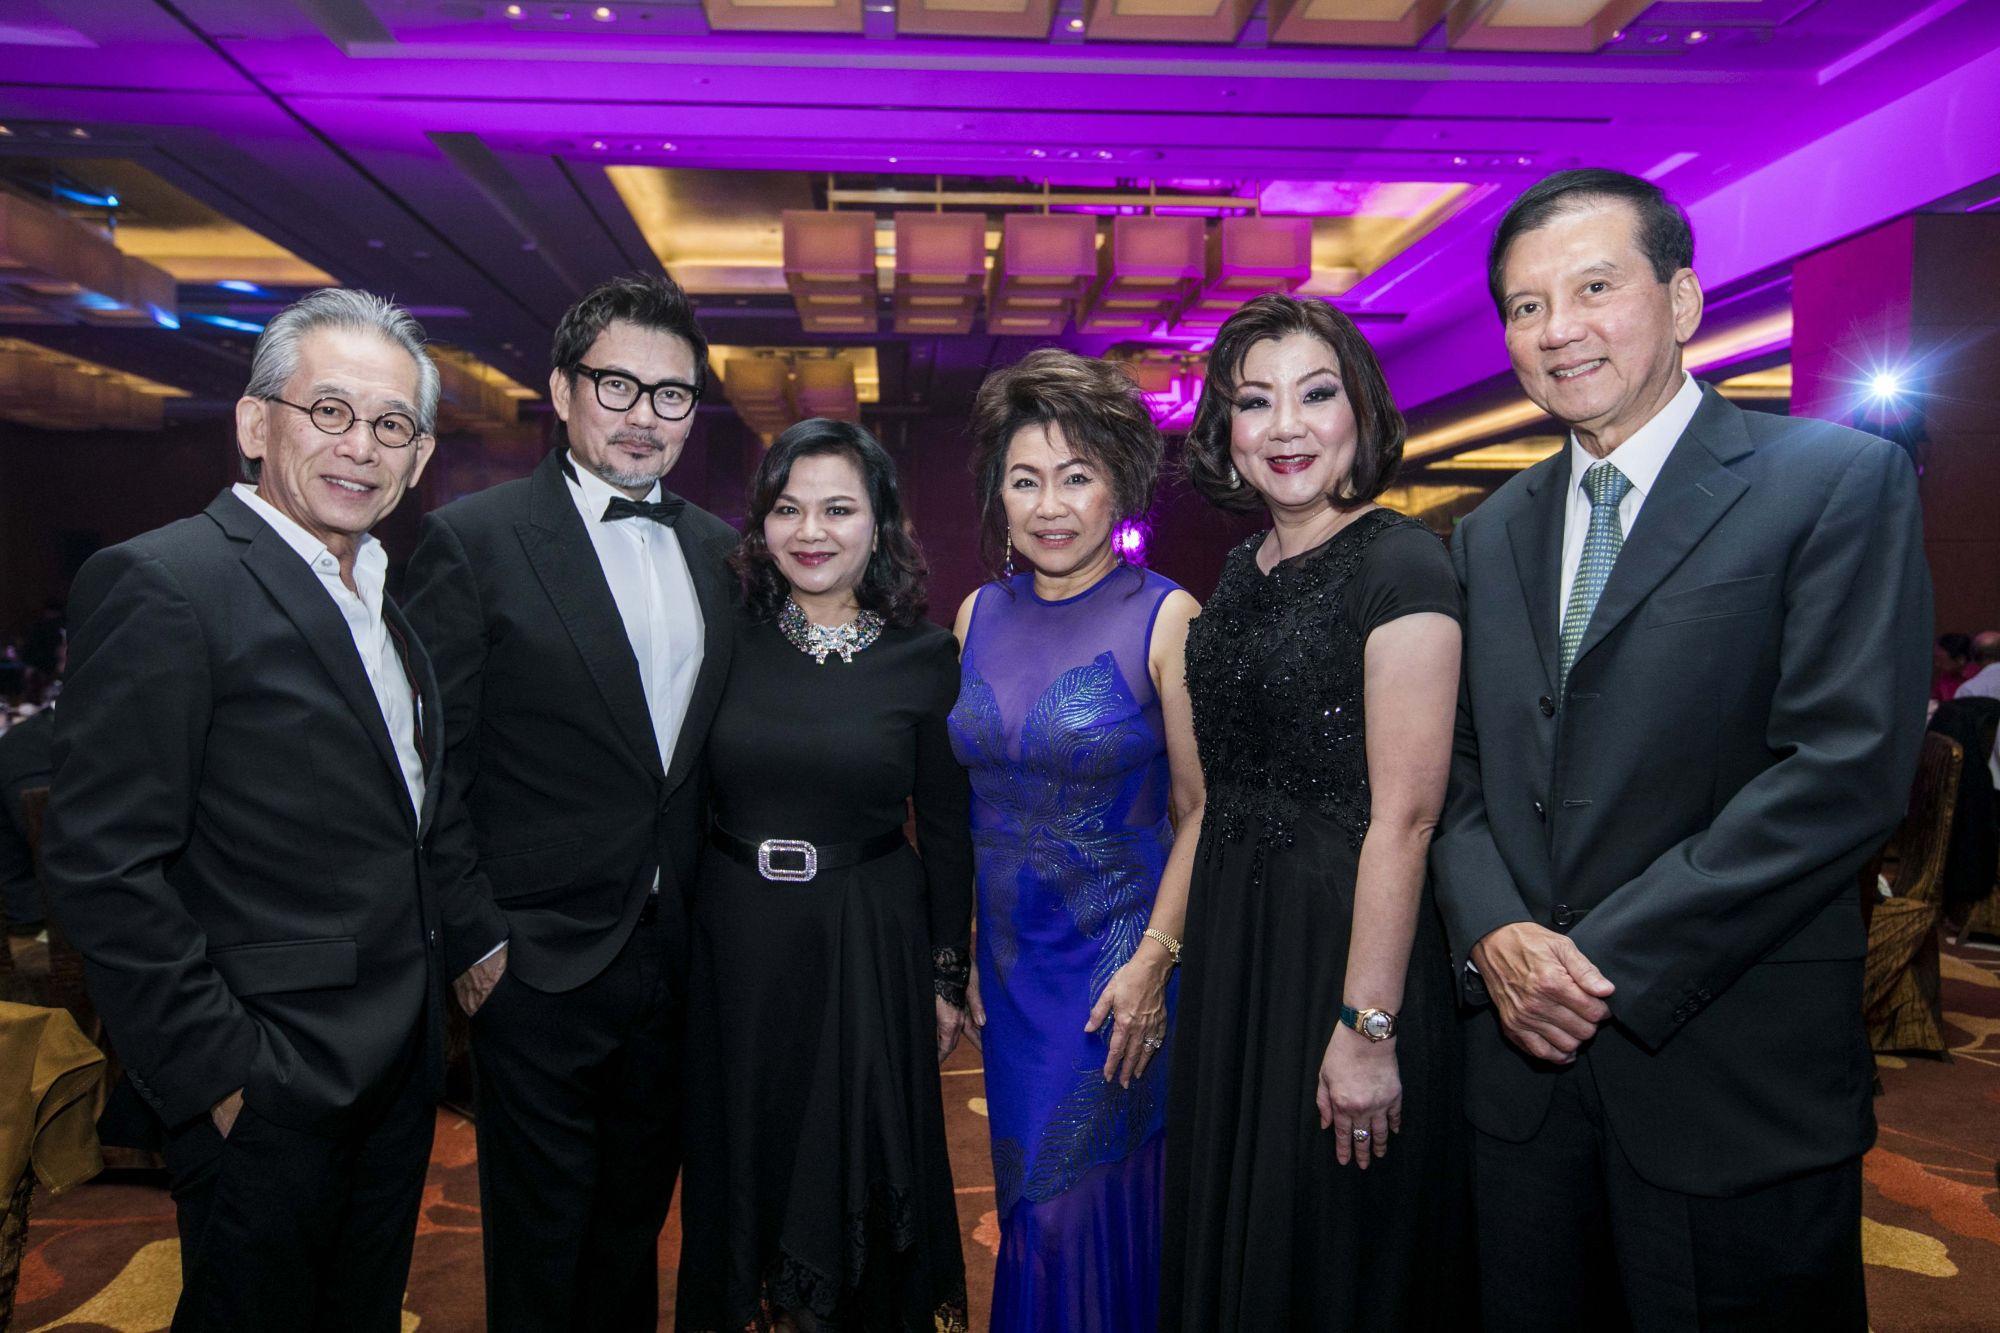 Simon Ong, Mervin Wee, Jean Yip, Lucy Ooi, Carol Tan, Alex Ooi